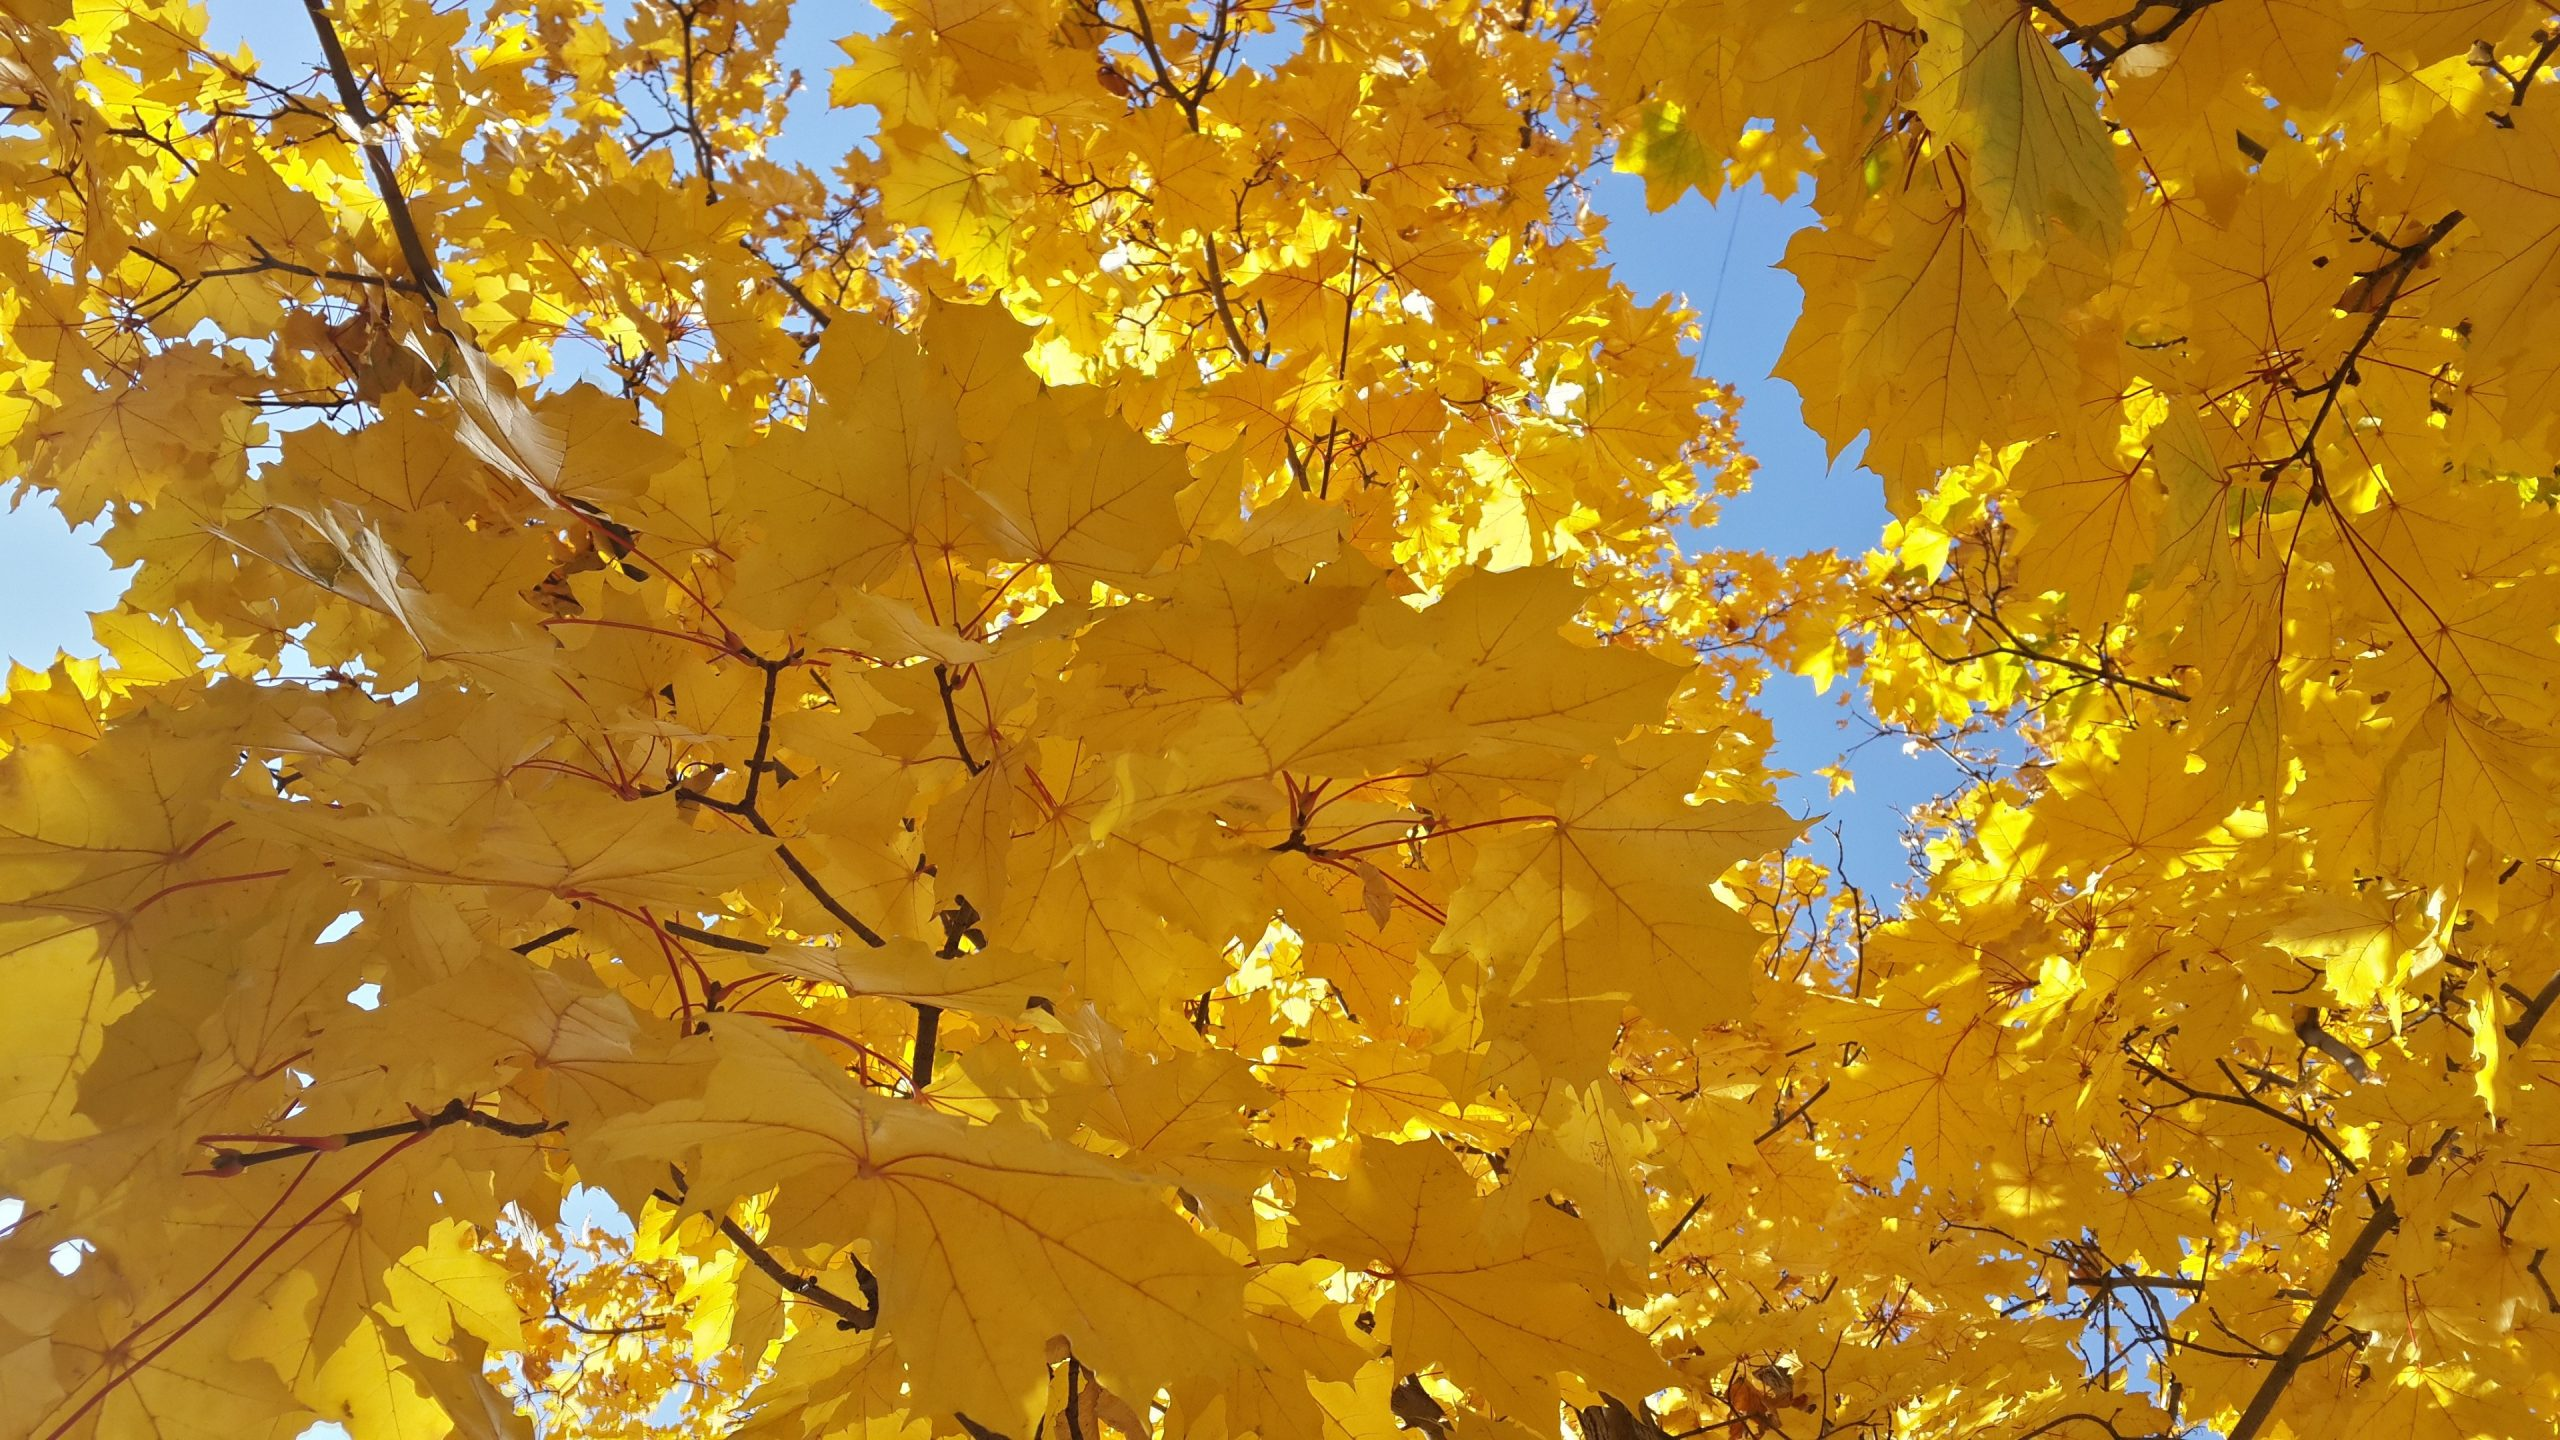 Spring Iphone 6 Wallpaper Yellow Leaves Wallpaper 4k Background Hd Wallpaper